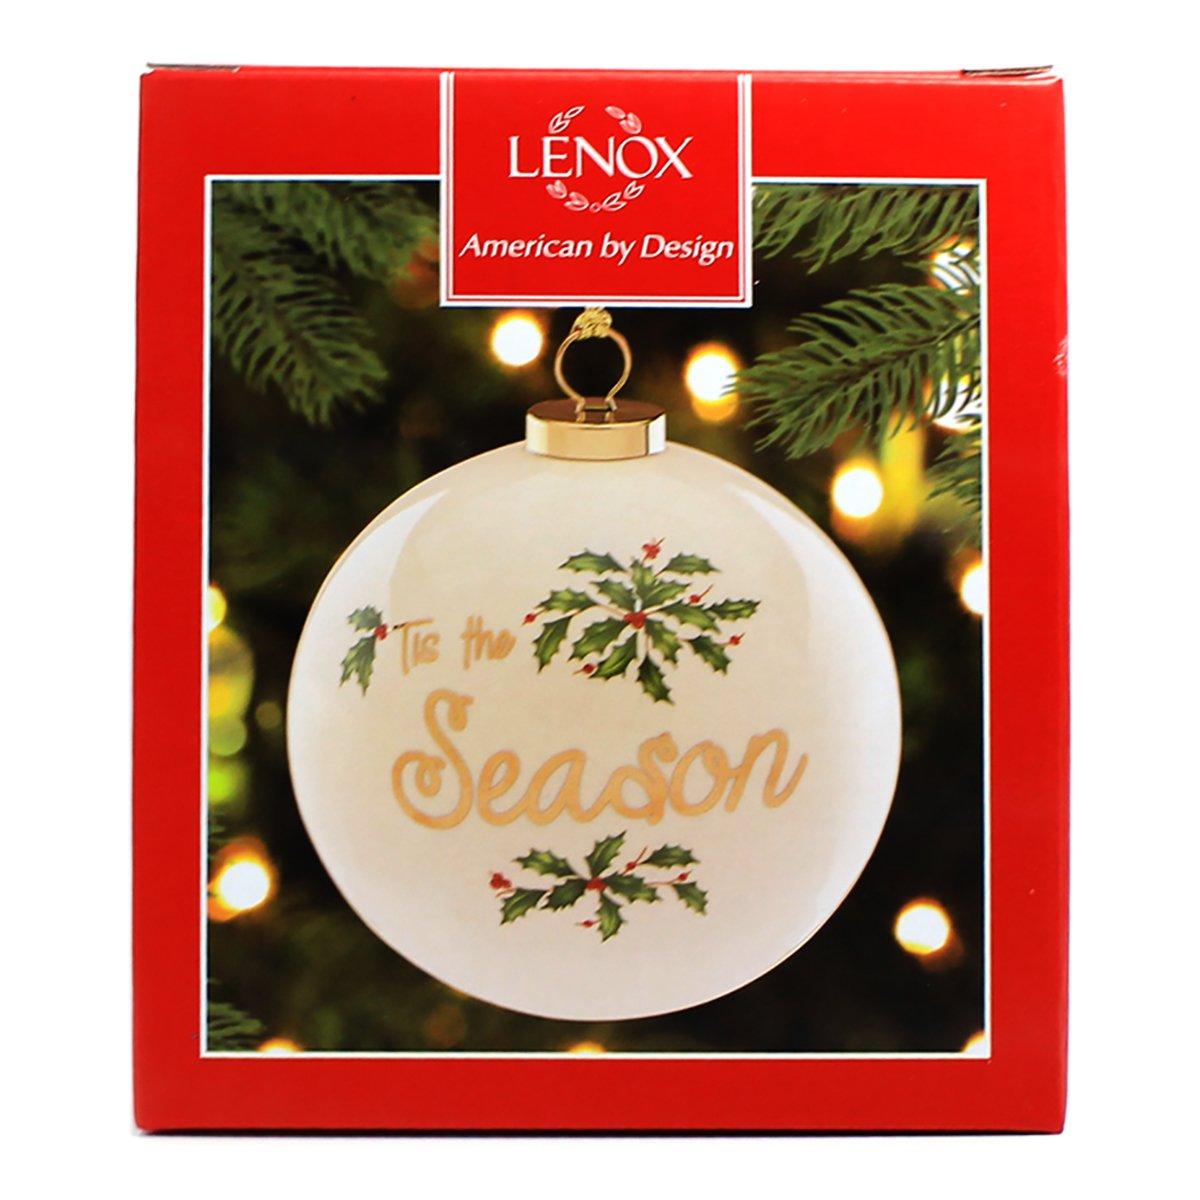 Ivory Lenox Tis The Season 4-in Ball Ornament